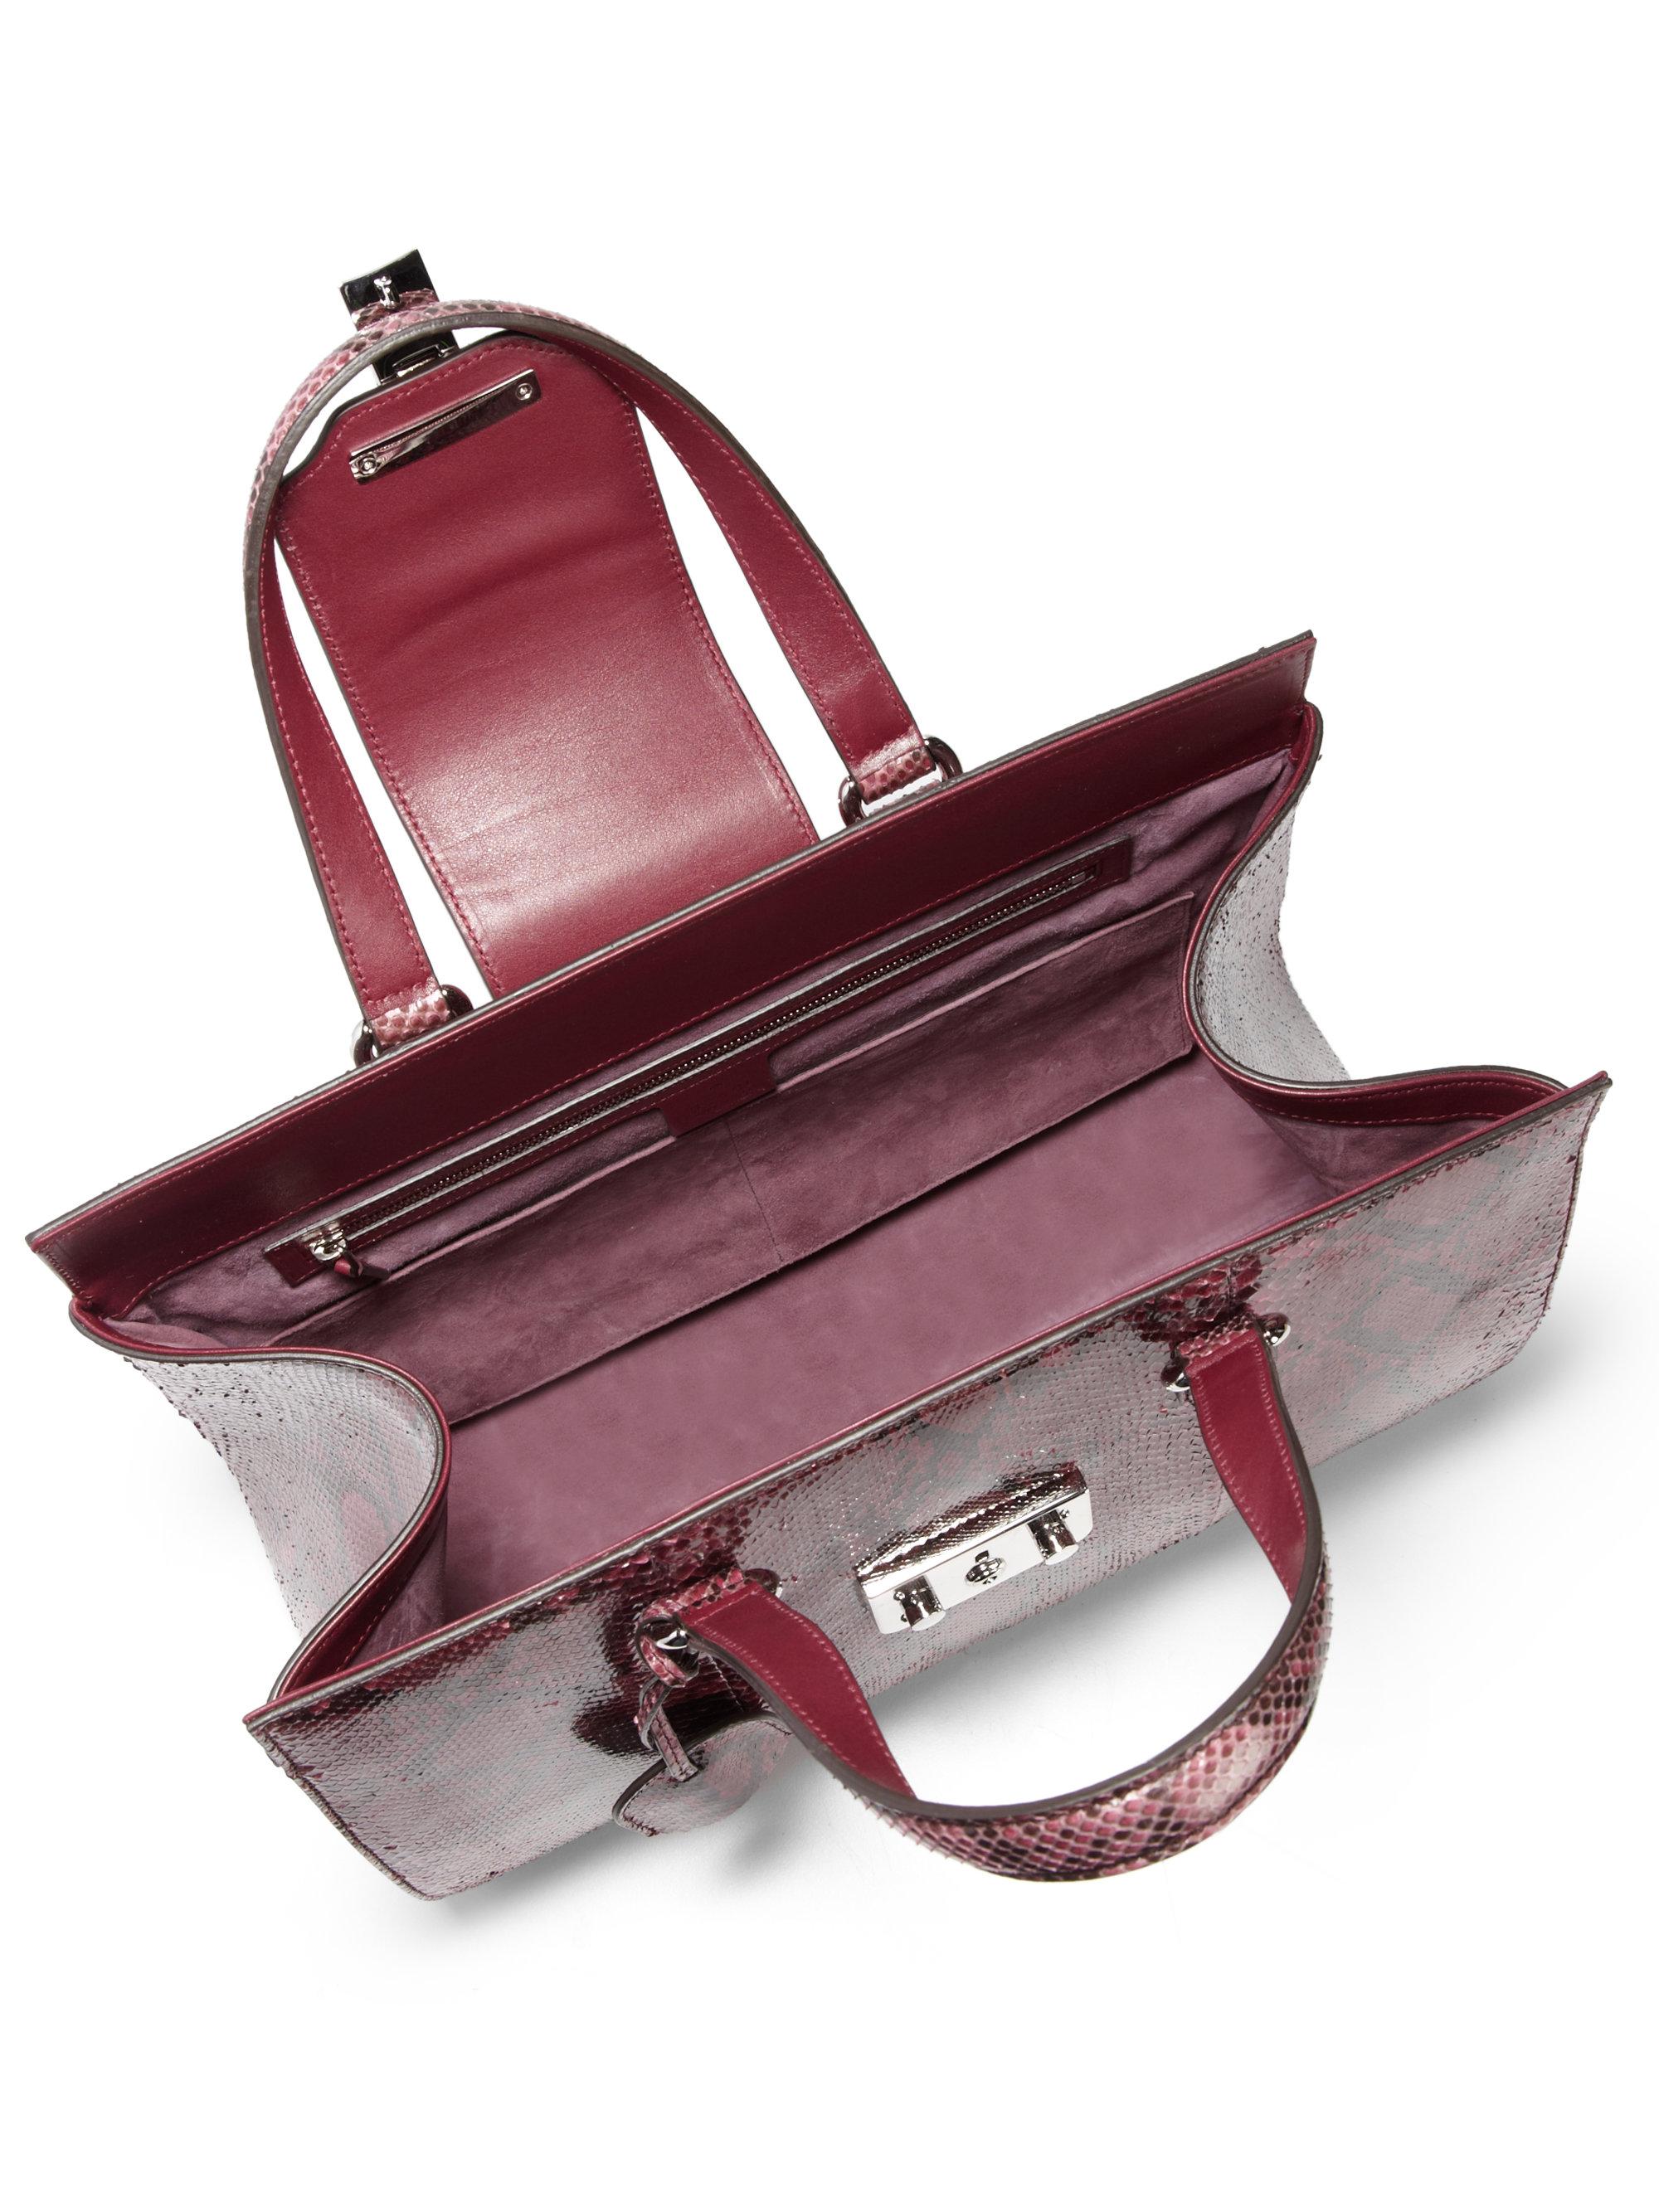 8f5b8875134 Lyst - Gucci Lady Lock Python Tote in Purple